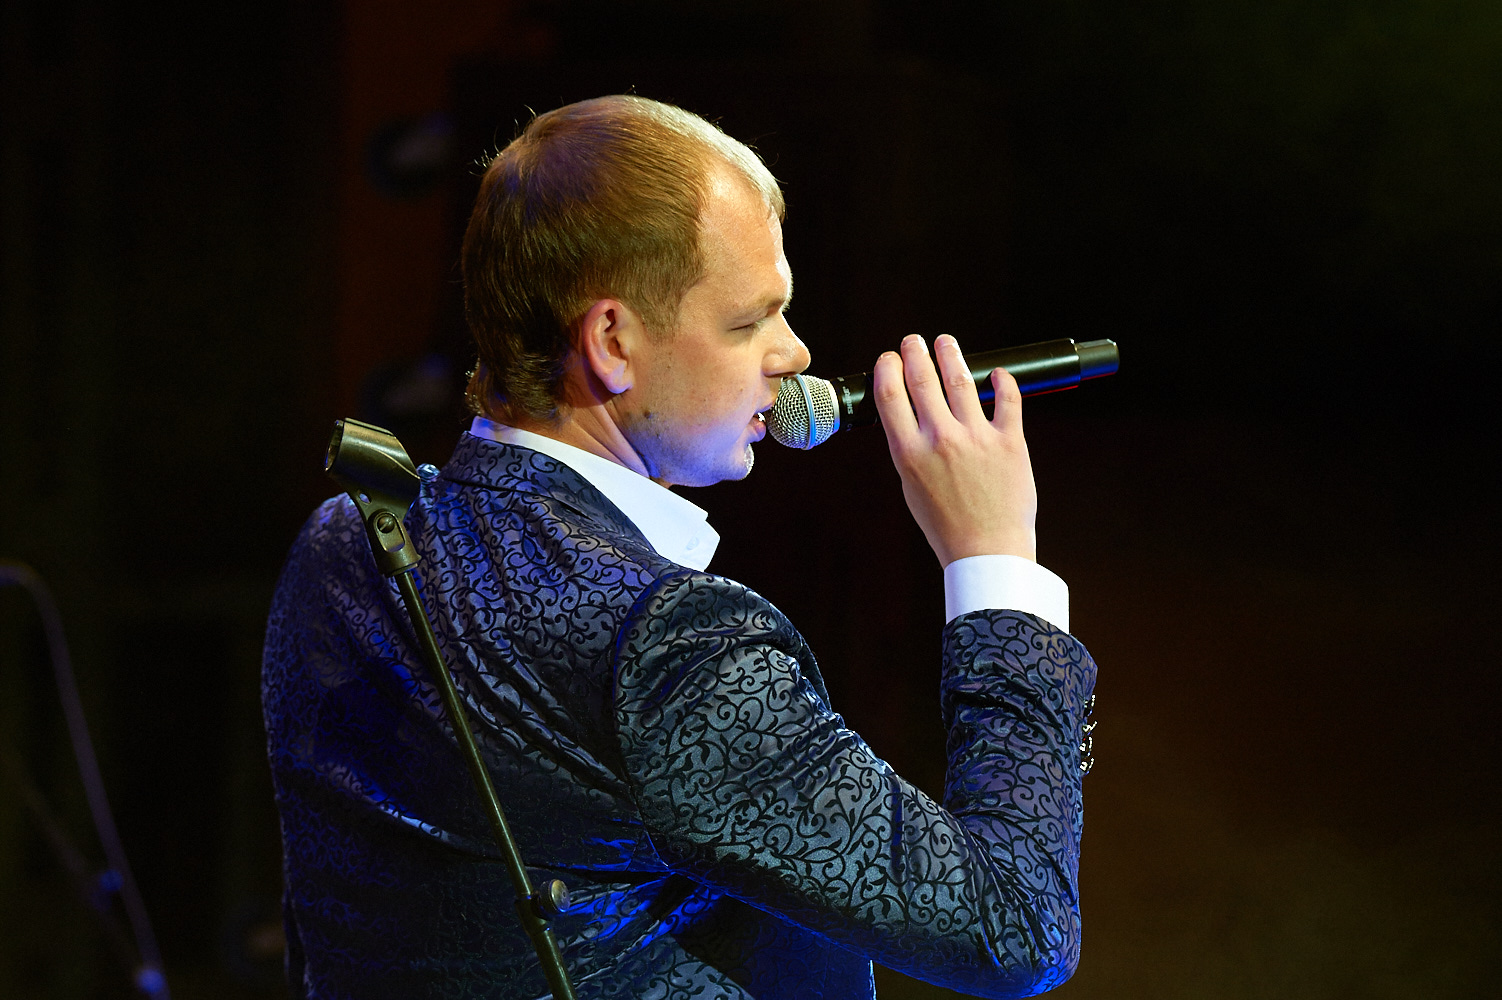 Концерт в Липецке 2016